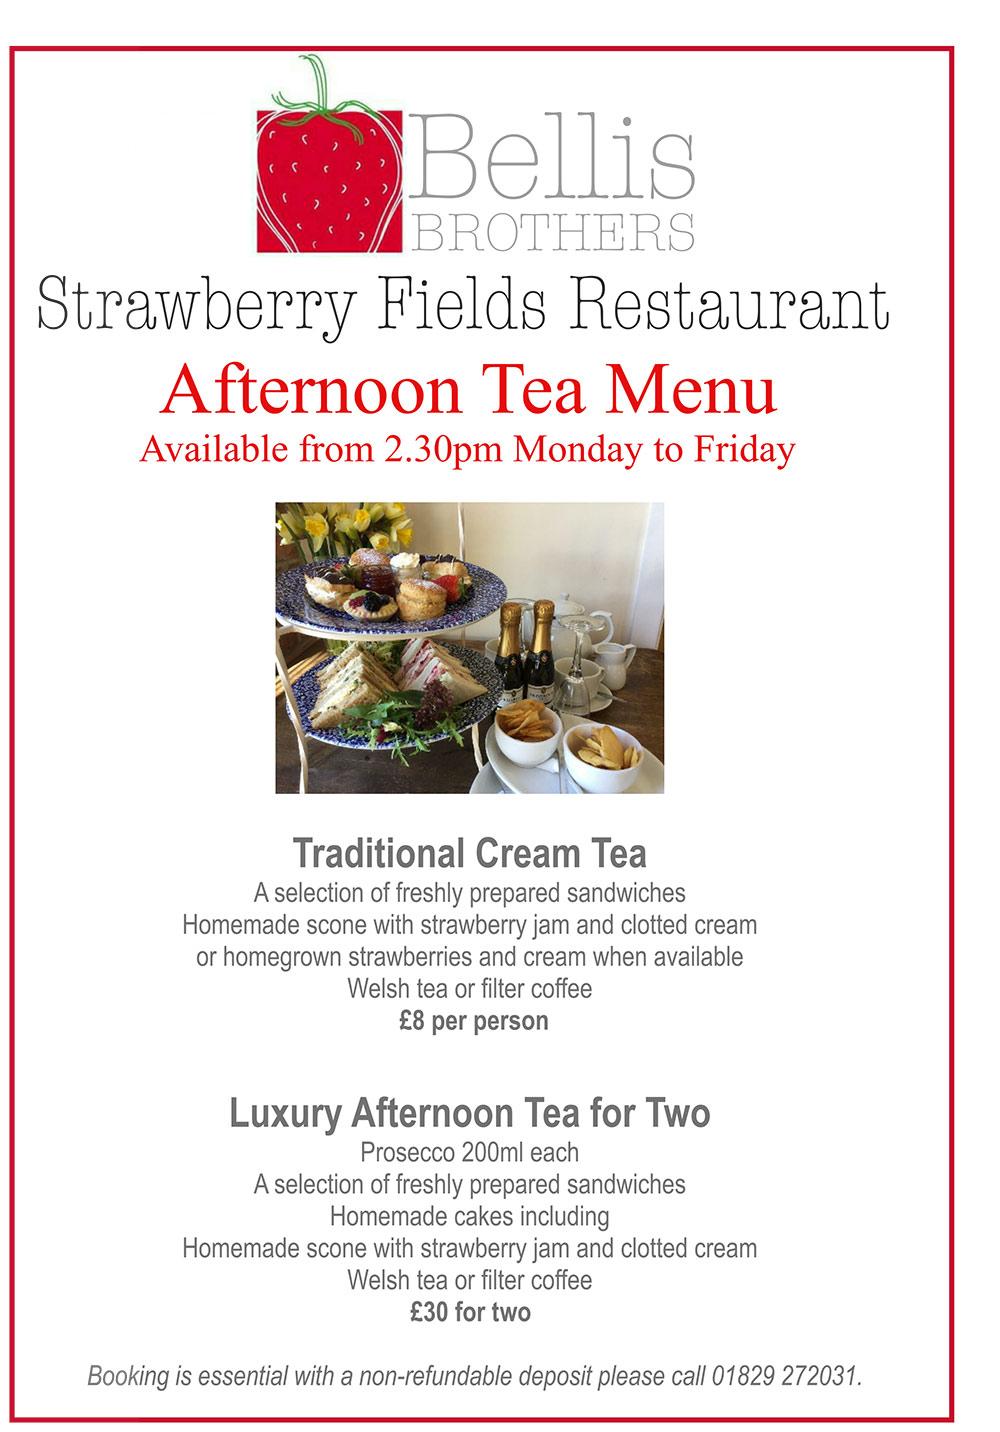 Download our Afternoon Tea Menu